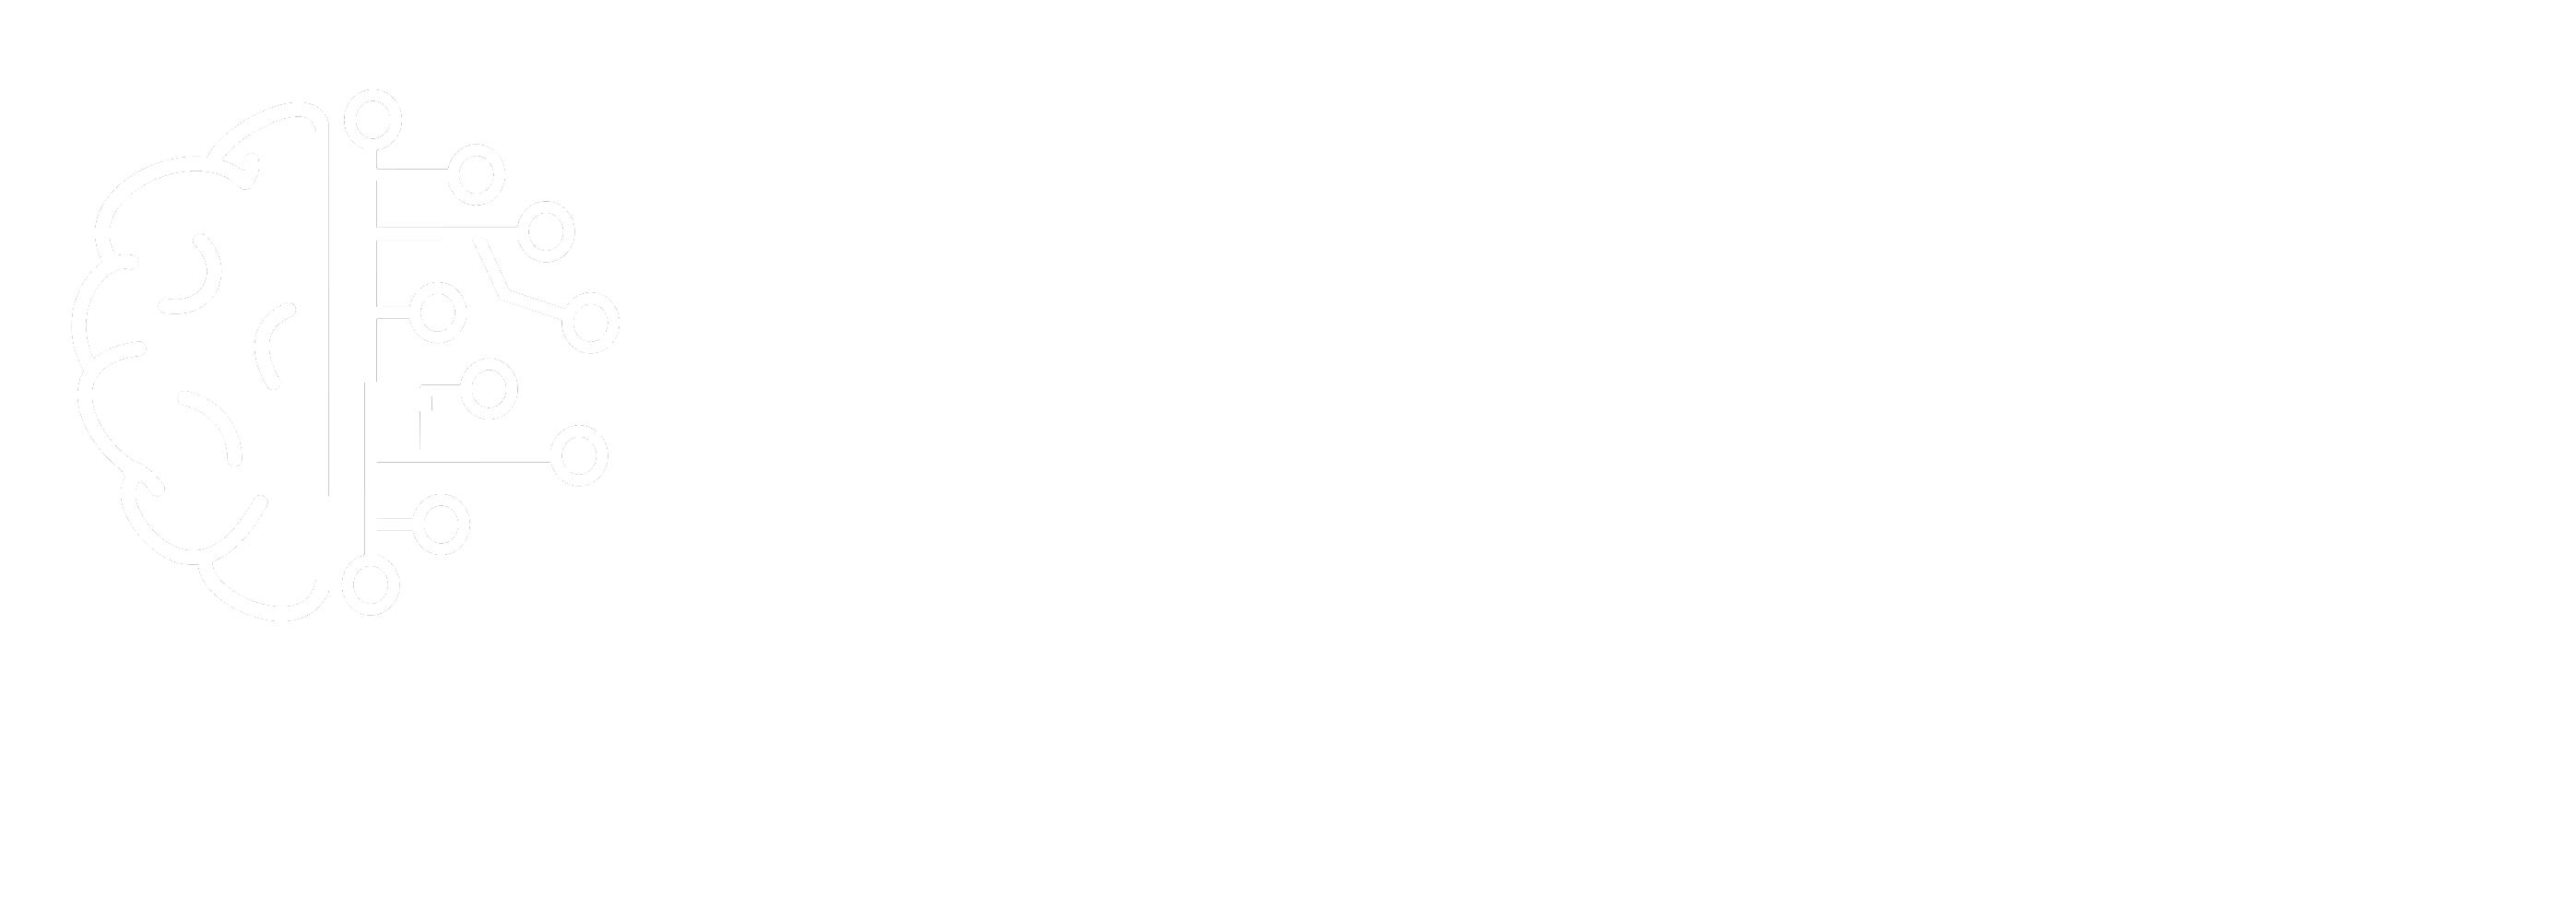 Nuevo-Smartme-NEGATIVO